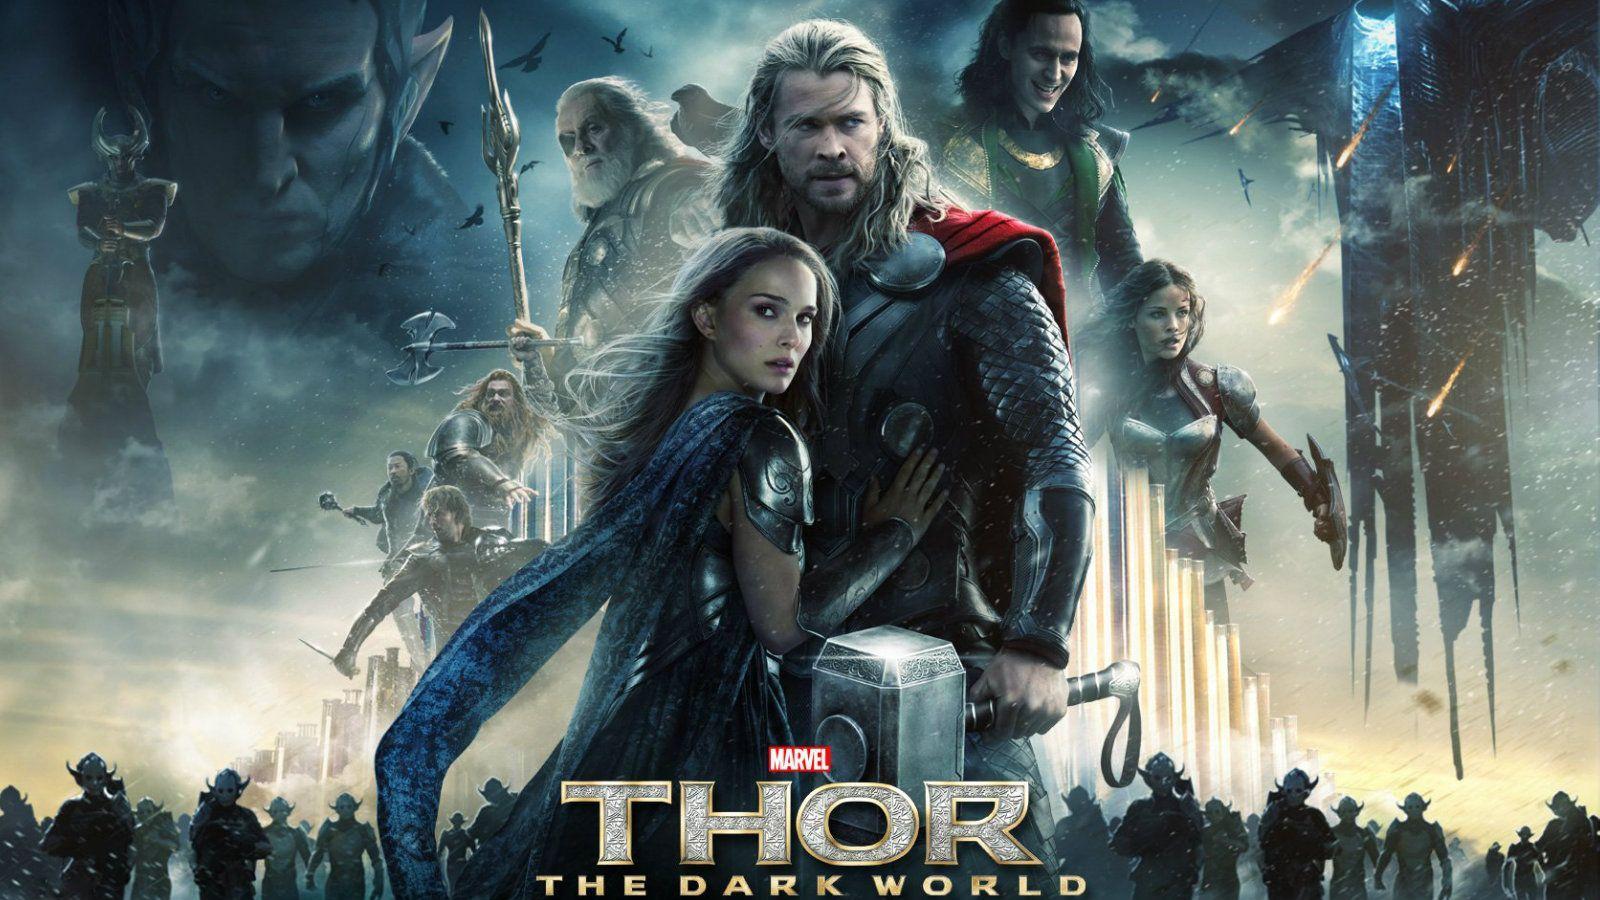 Thor The Dark World Wallpapers Top Free Thor The Dark World